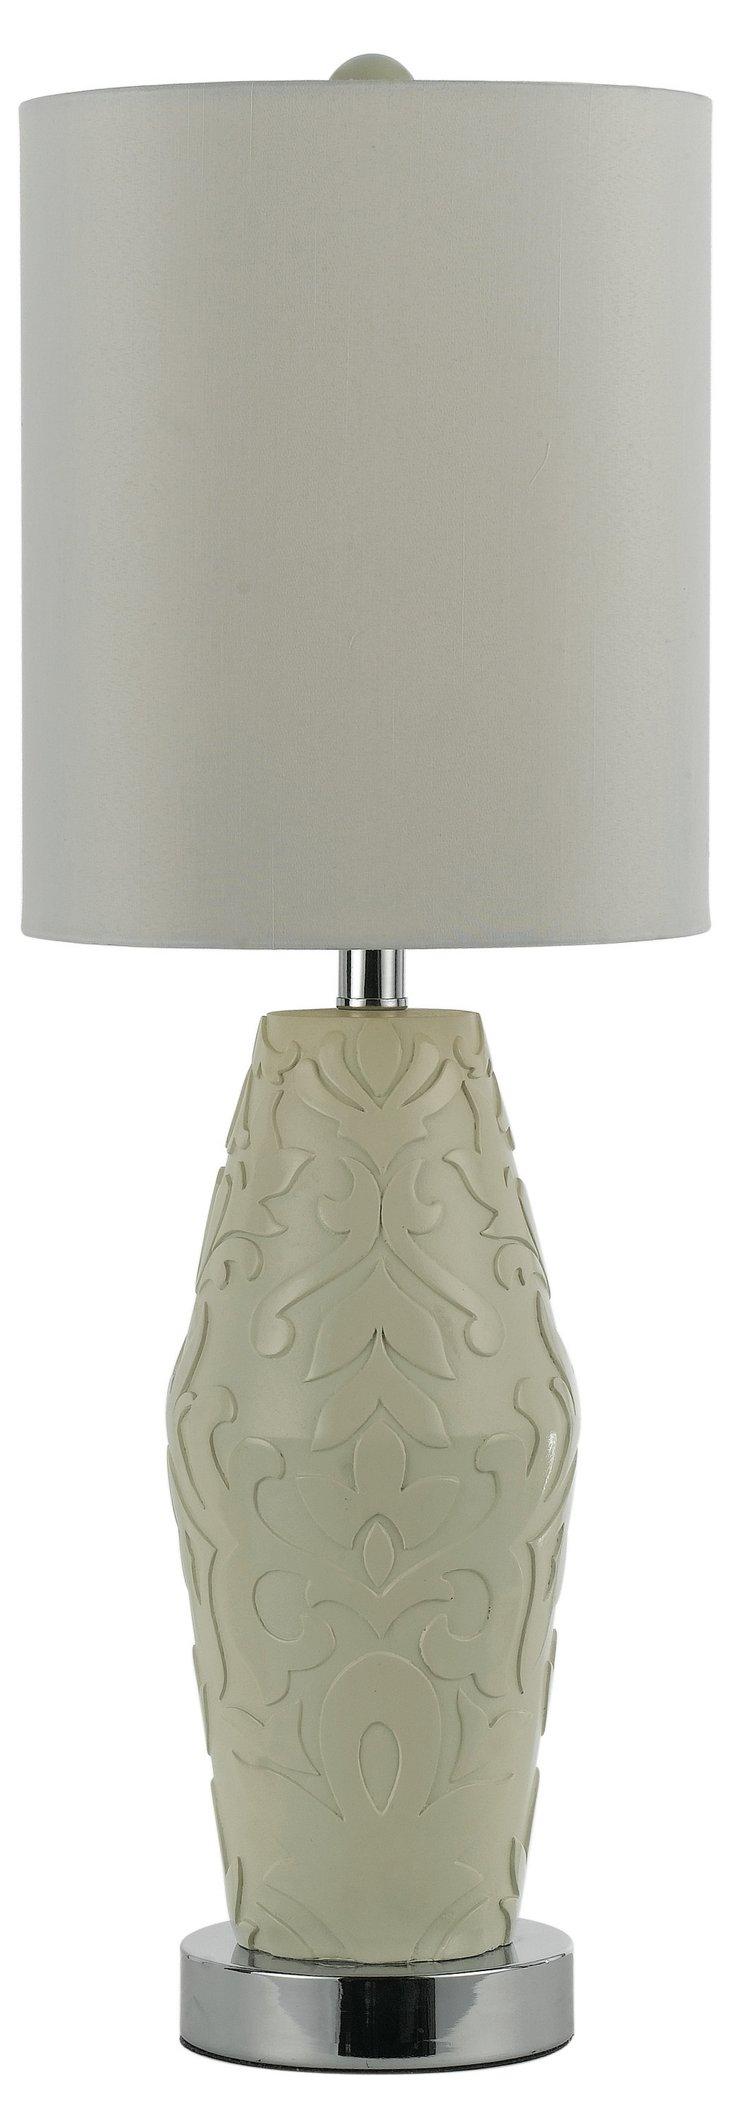 Sweet Dream Table Lamp, Pearl